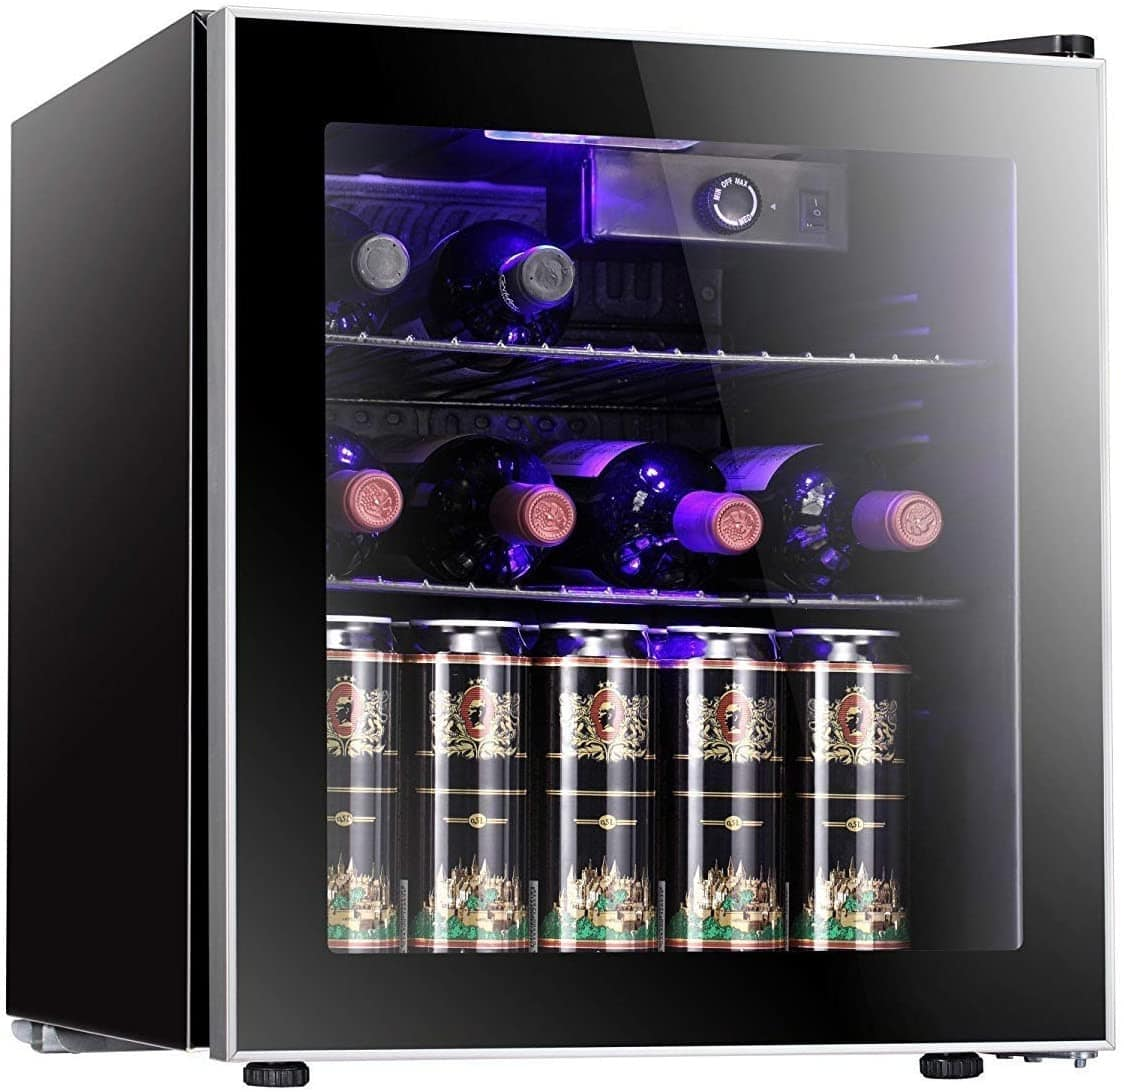 Antarctic Star Countertop Refrigerator